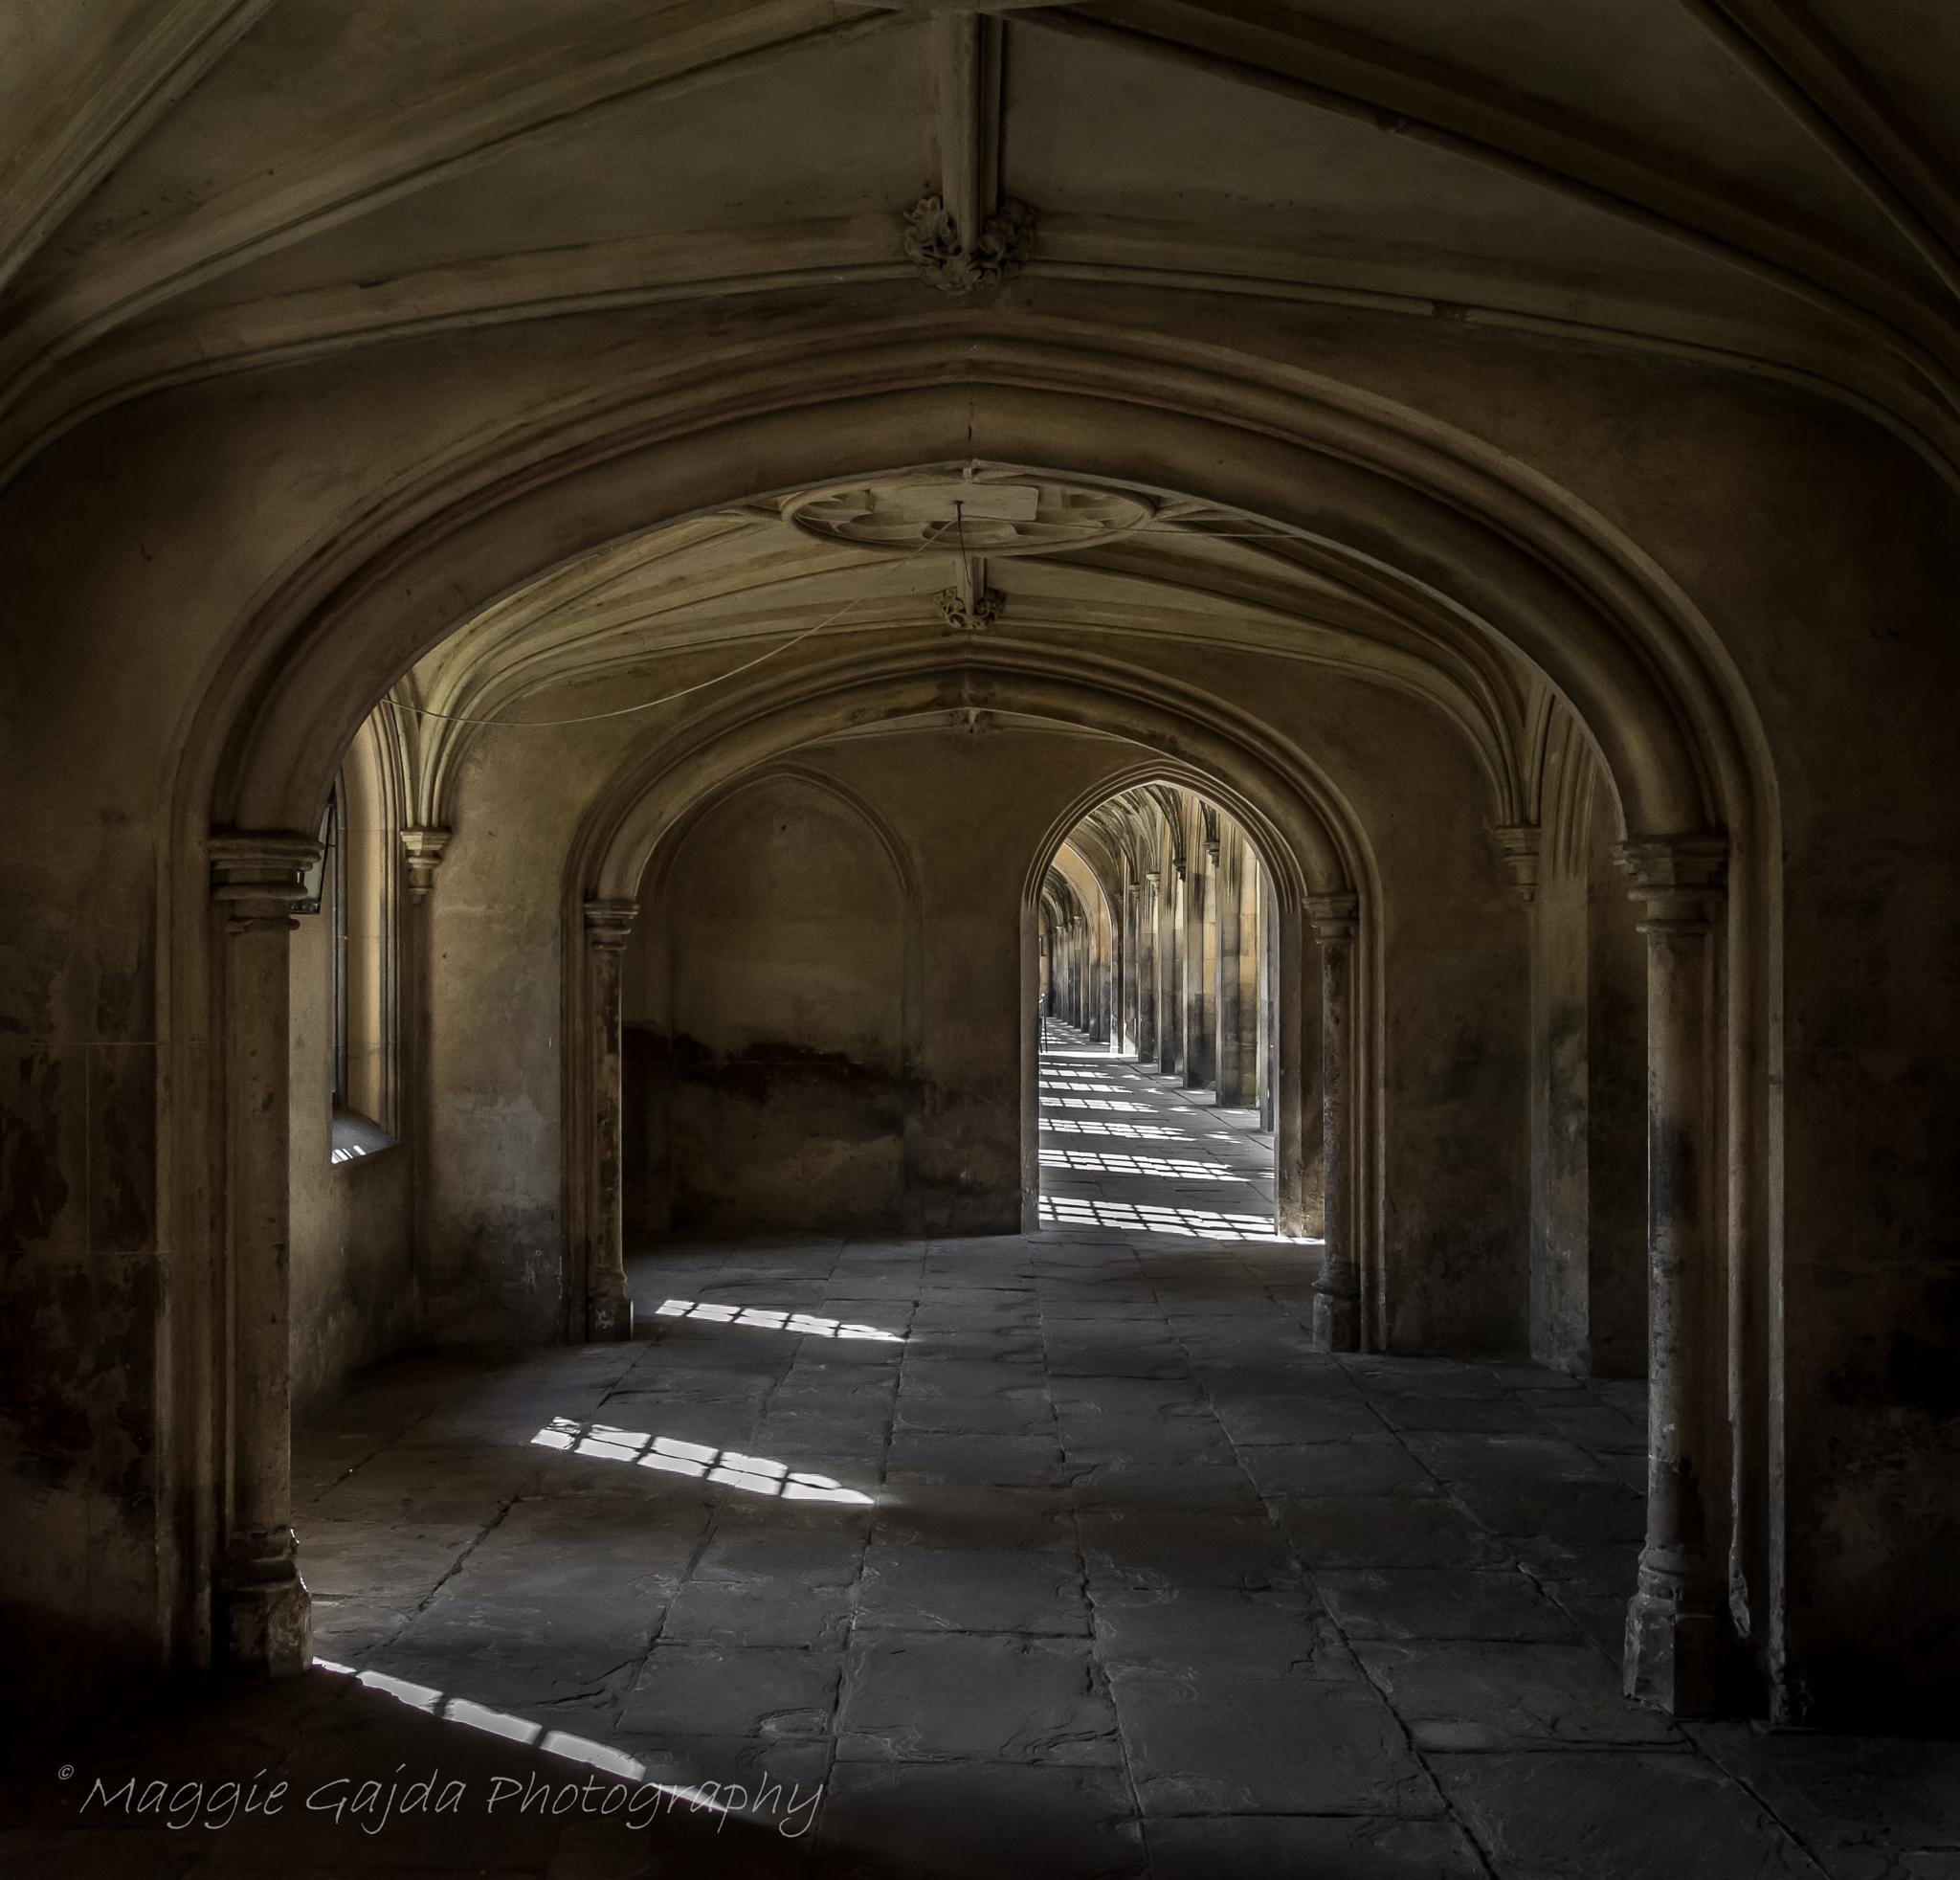 St John's College, Cambridge by maggie